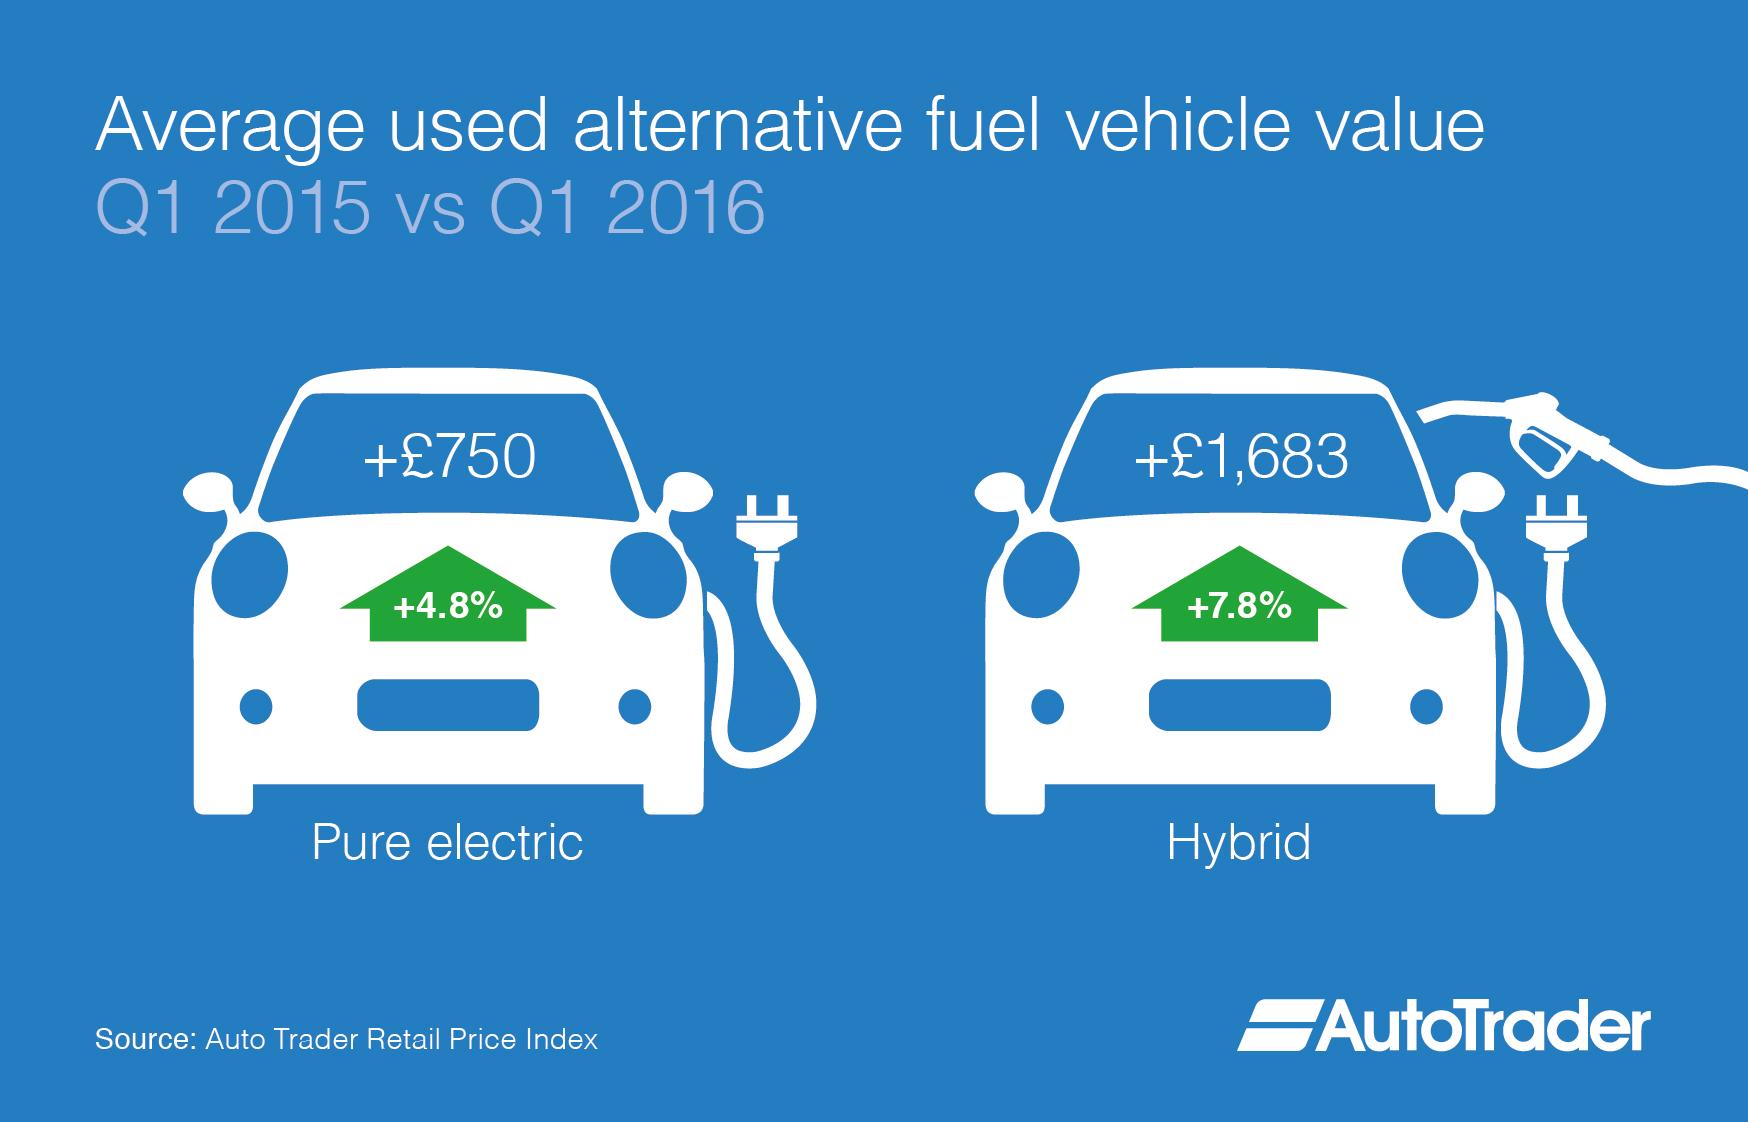 Alternative Fuel Vehicles (AFV) Average Used Car Values Grow Year-On ...